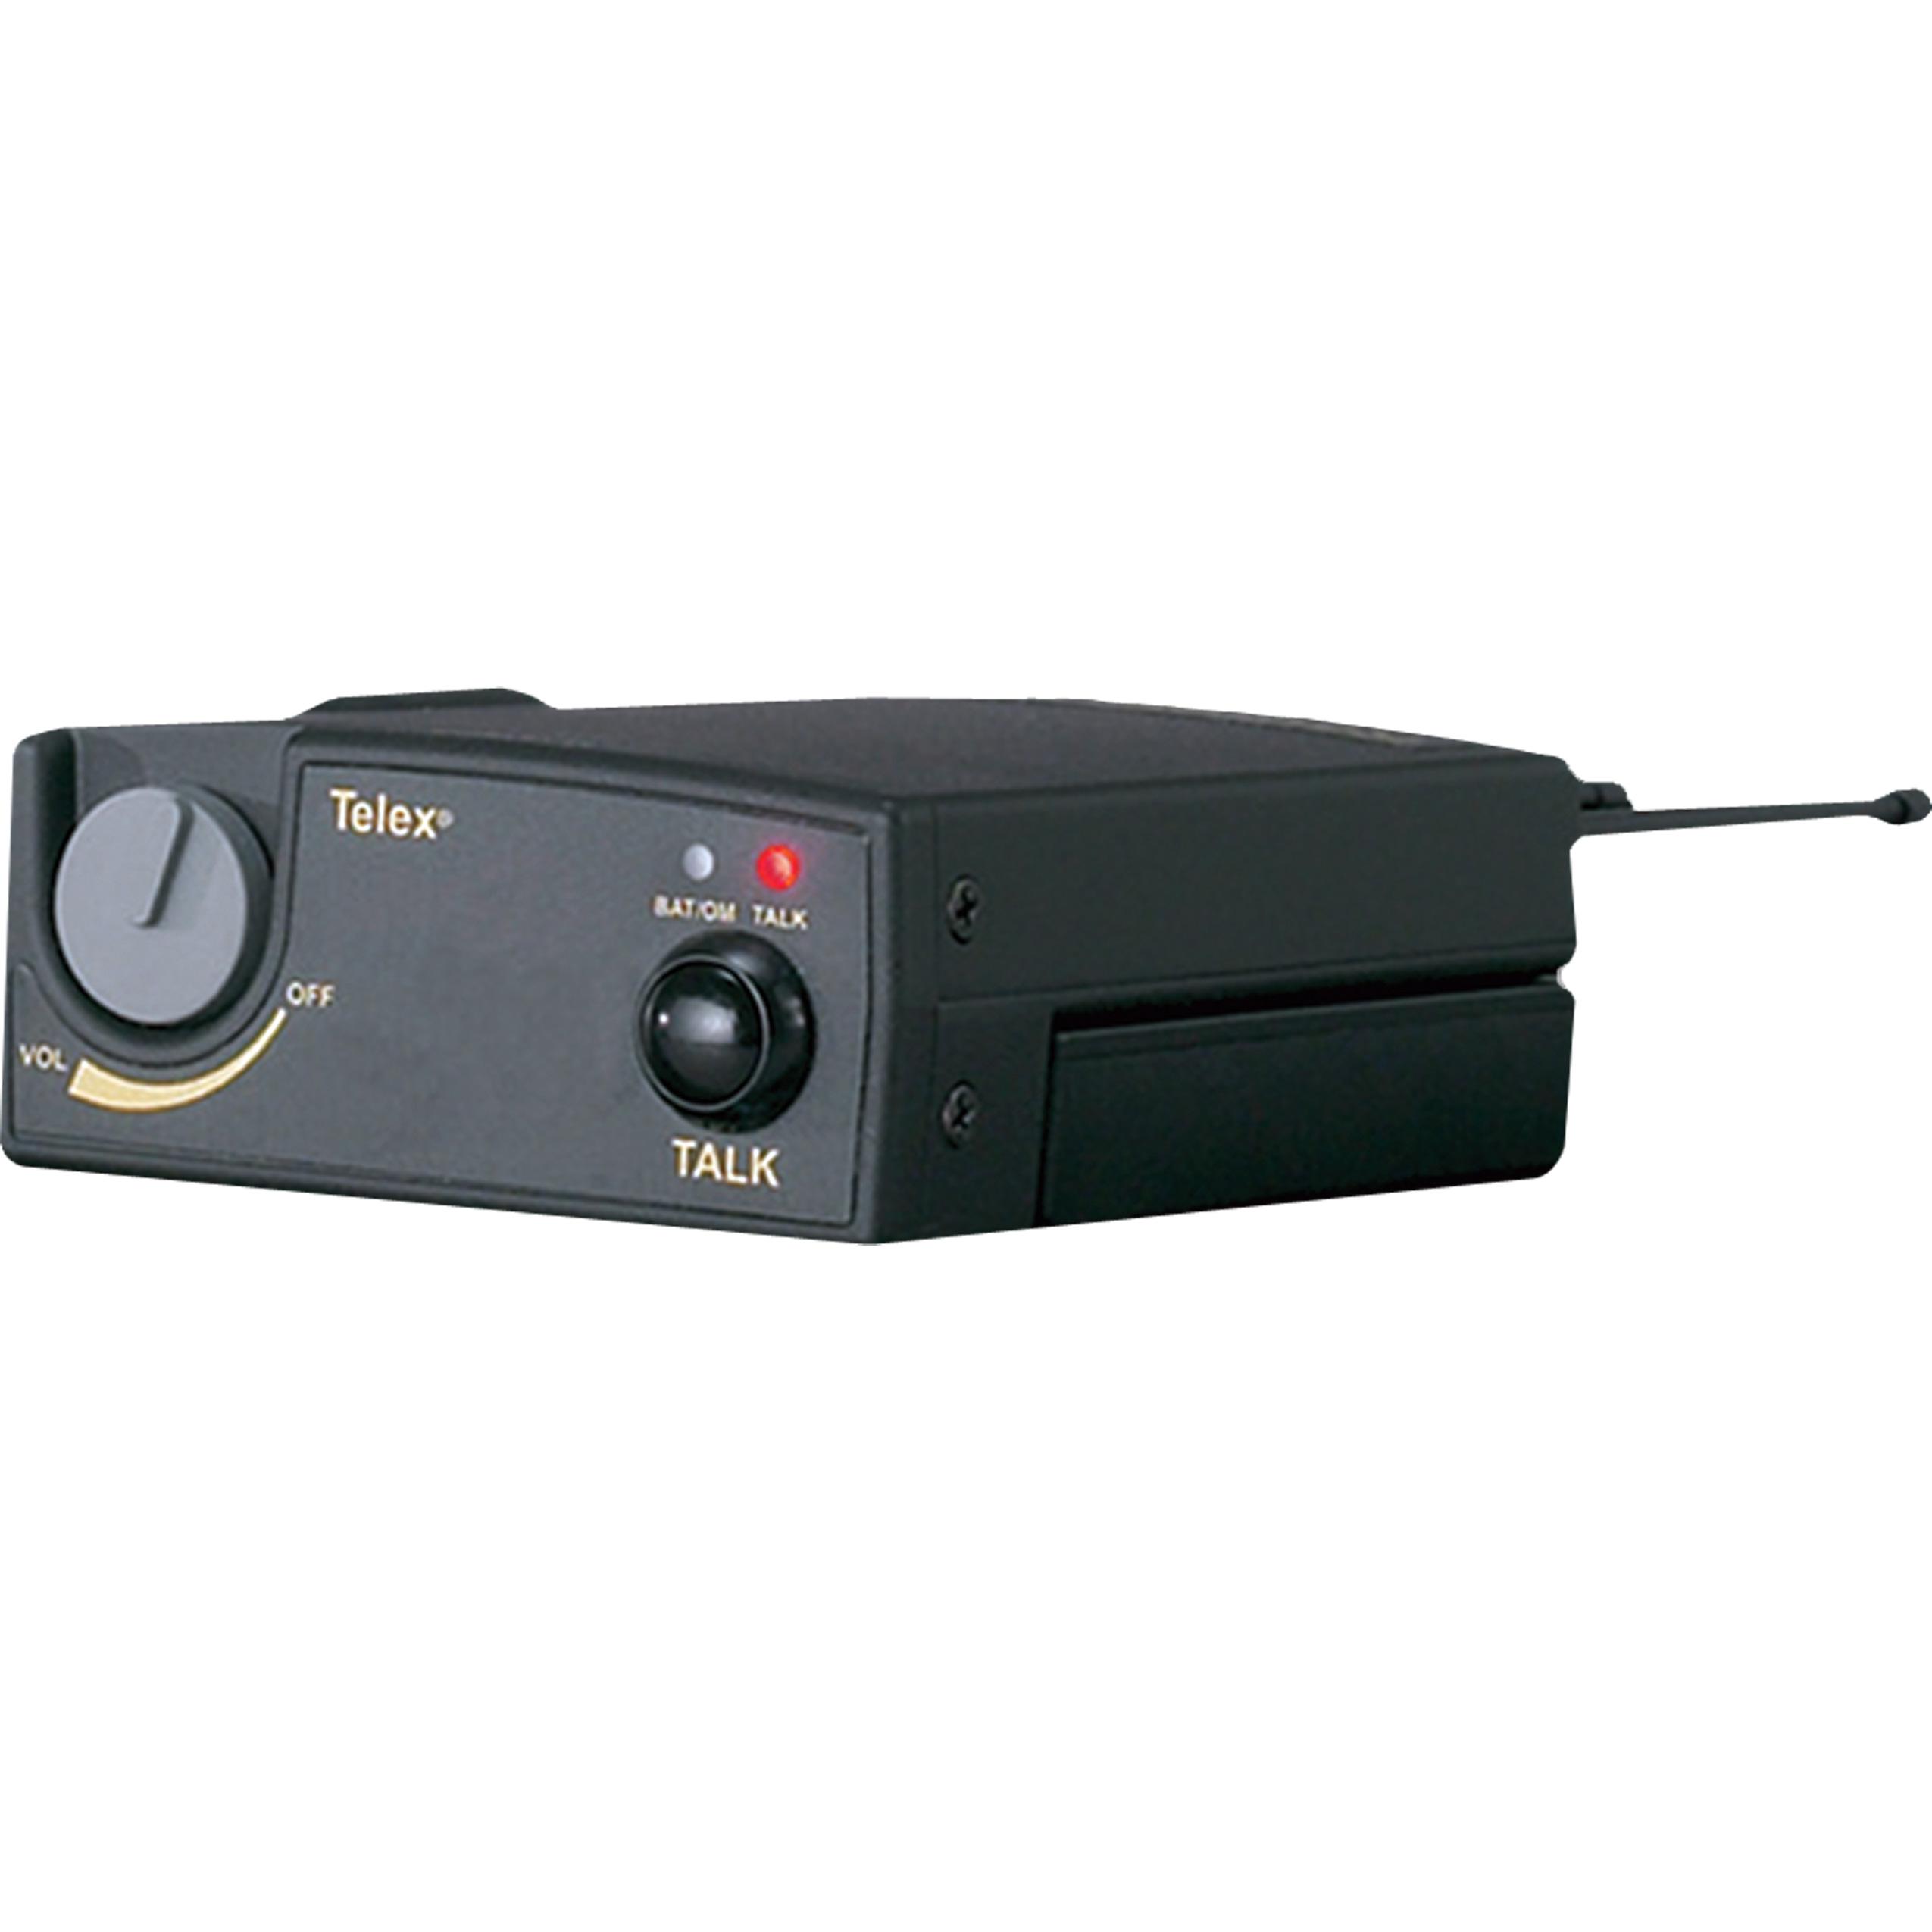 Telex Tr 700 B4 Belt Pack A4m Headset Jack Band Intercom Wiring Diagram Zoom